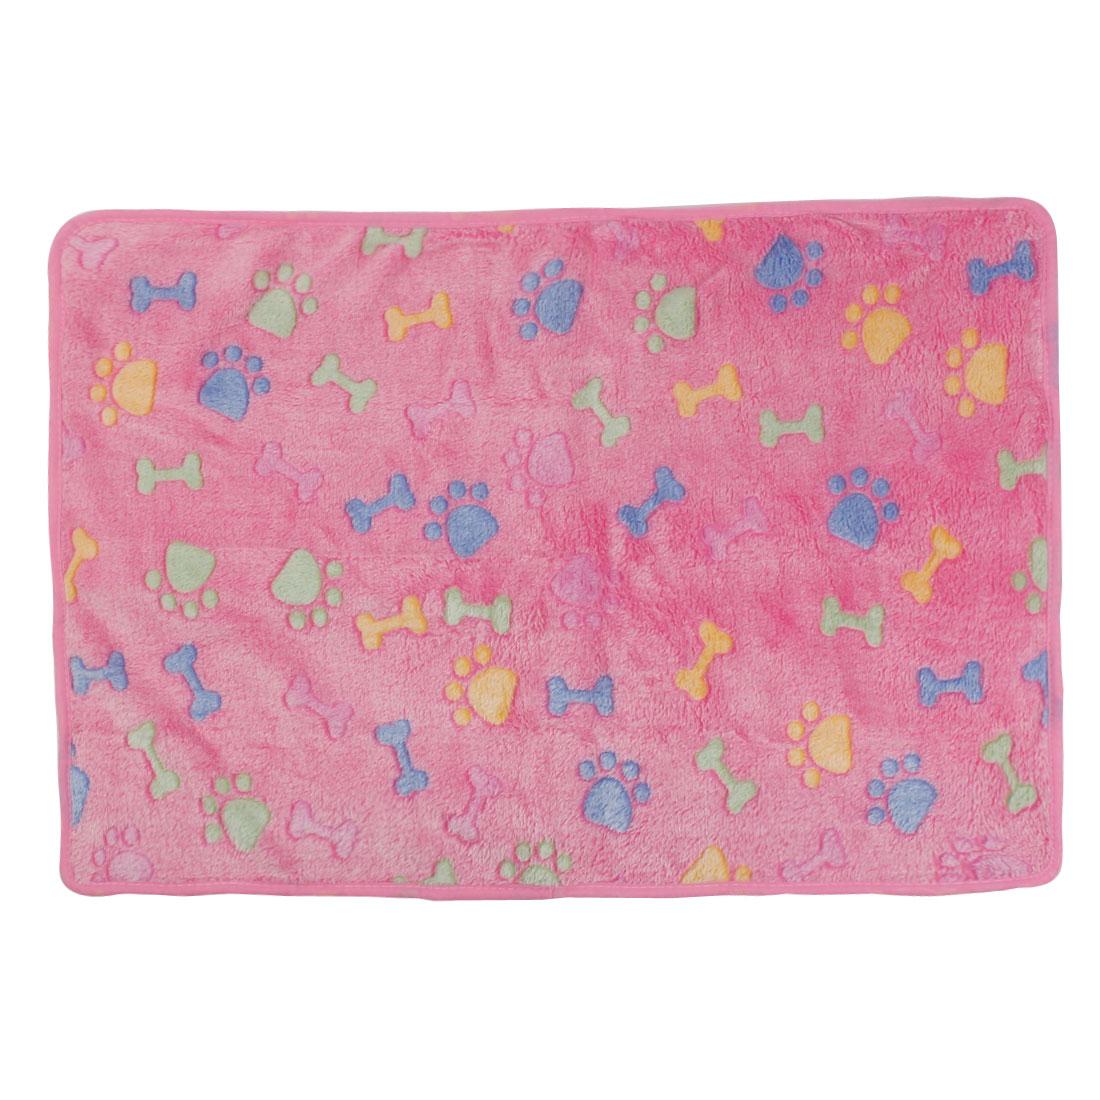 Pet Flannel Bone Print Doggy Bed Cushion Soft Warm Sleeping Mat Dog Blanket Pink